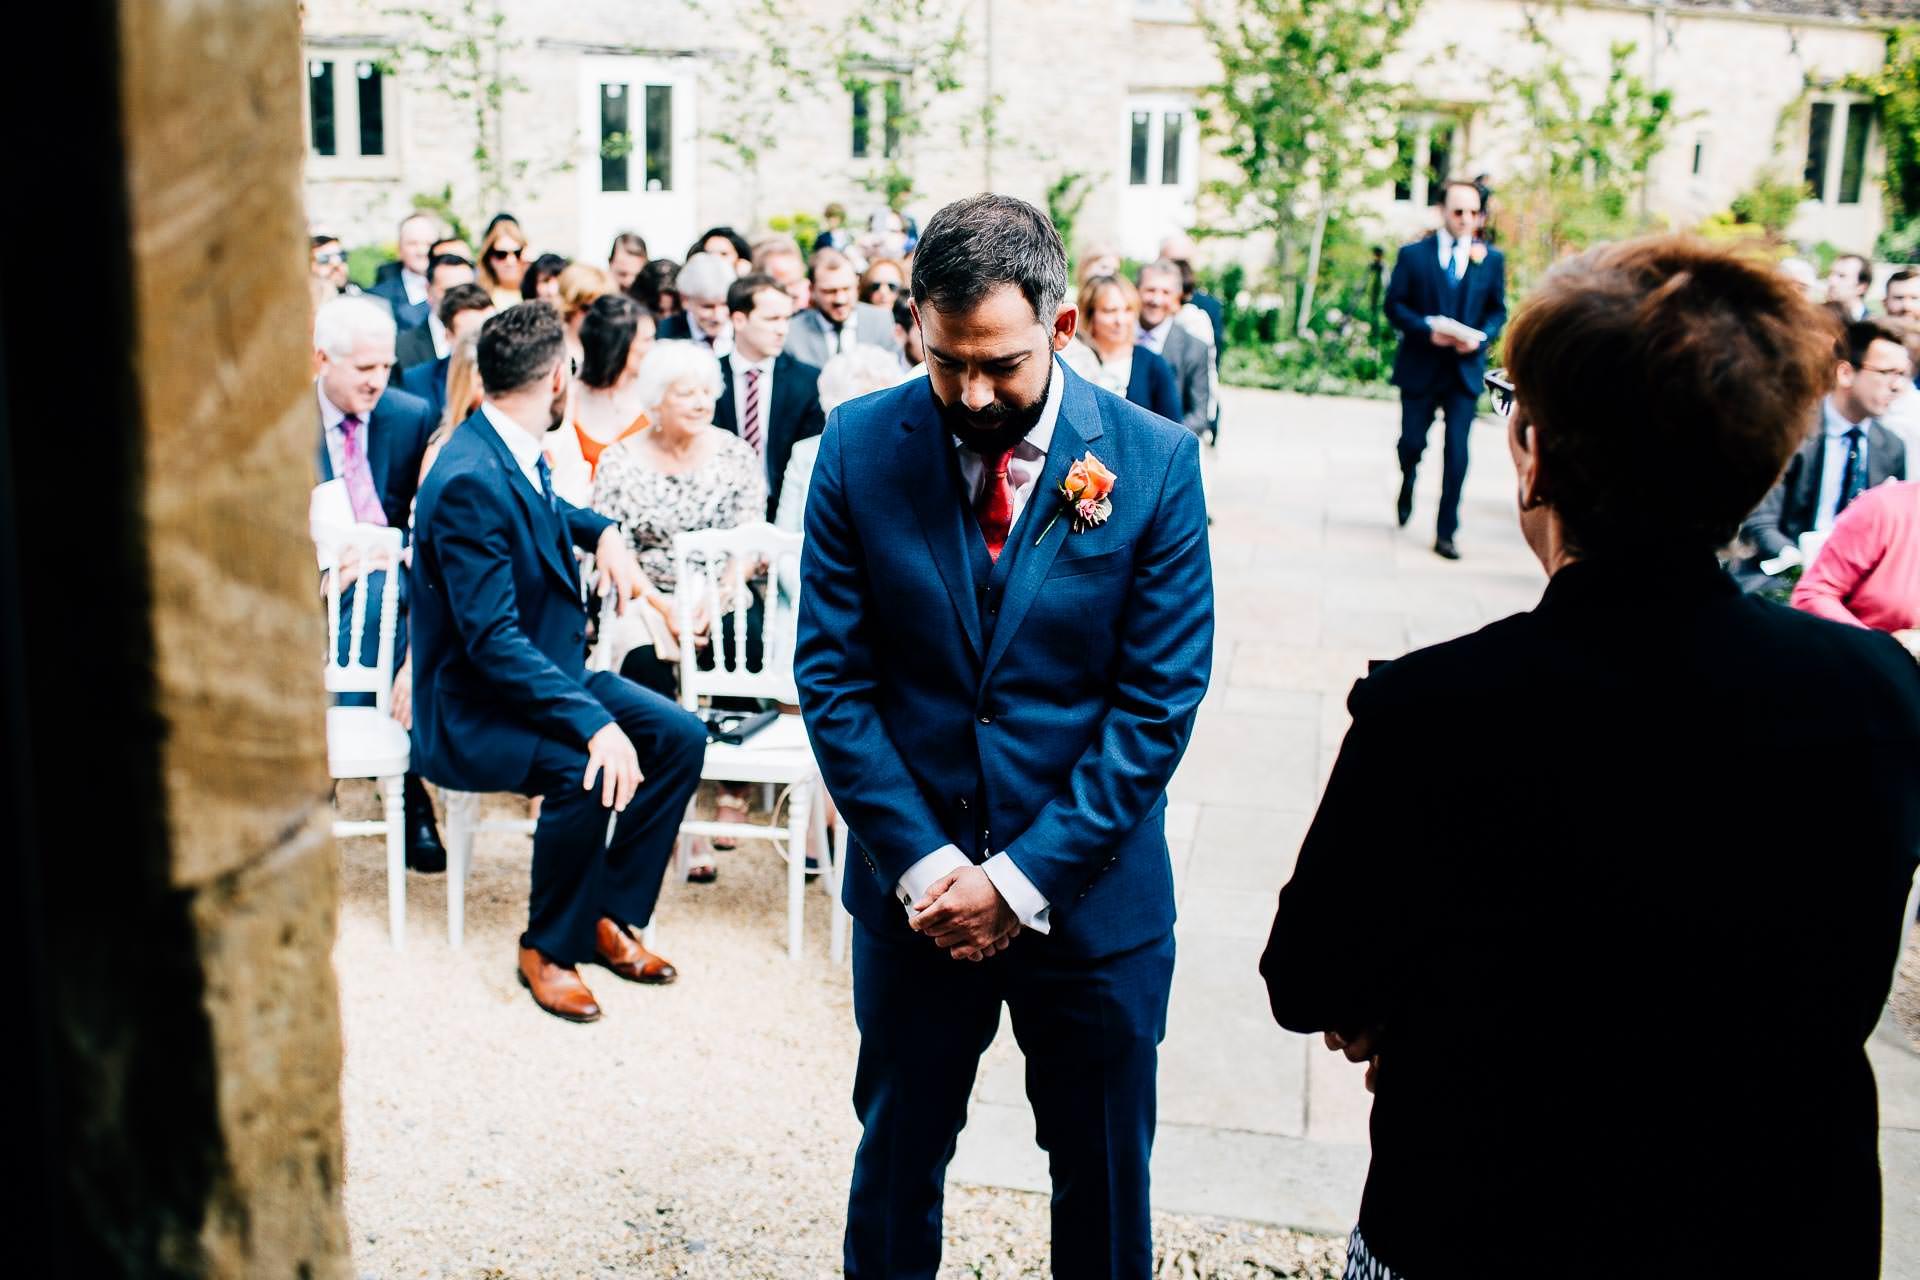 Caswell House Wedding Photography - Emma & Pete-68